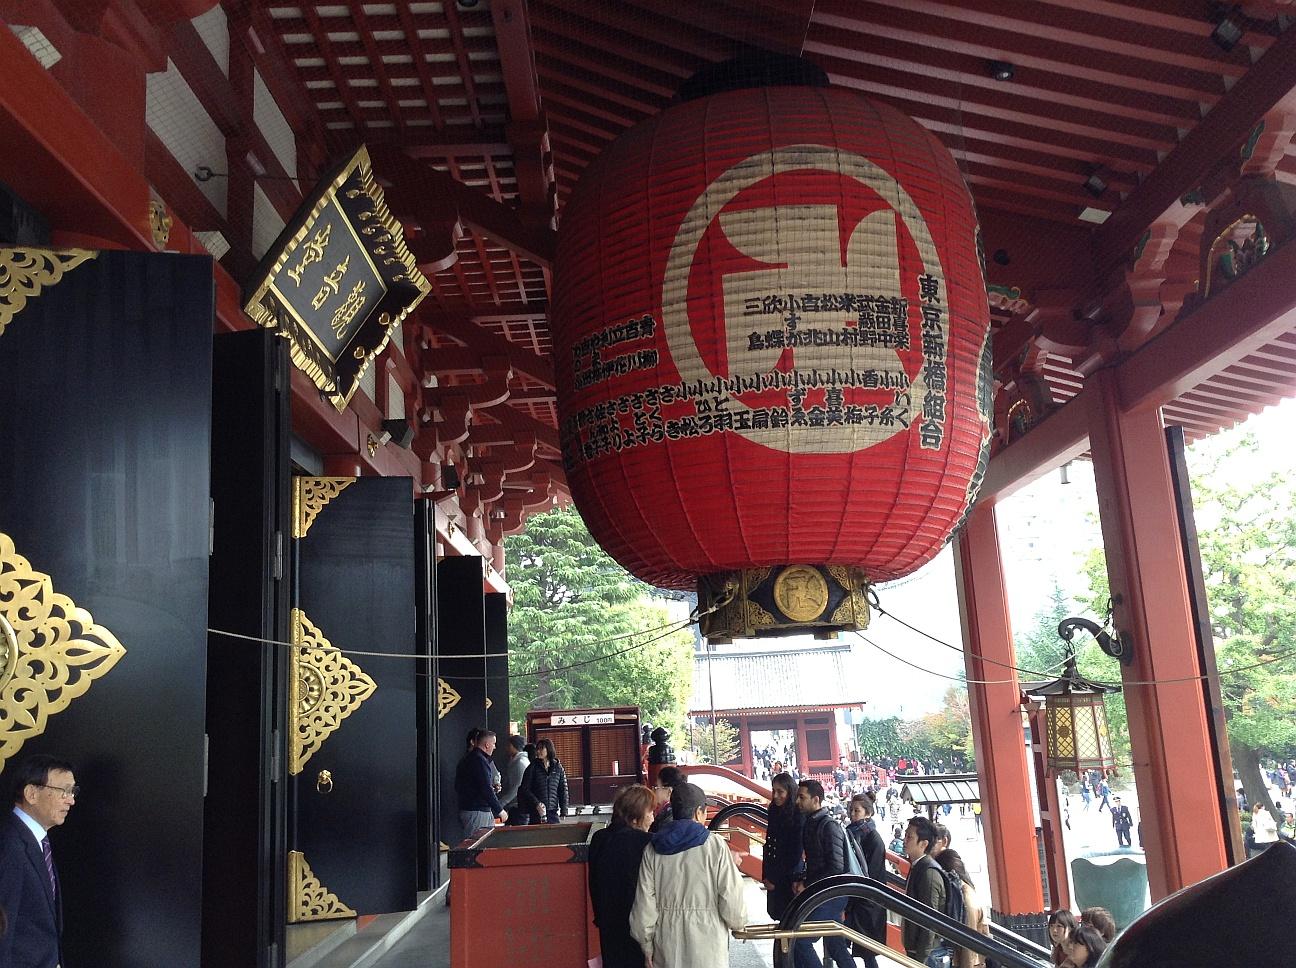 asakusa-sensoji-temple-credits-domenico-palladino